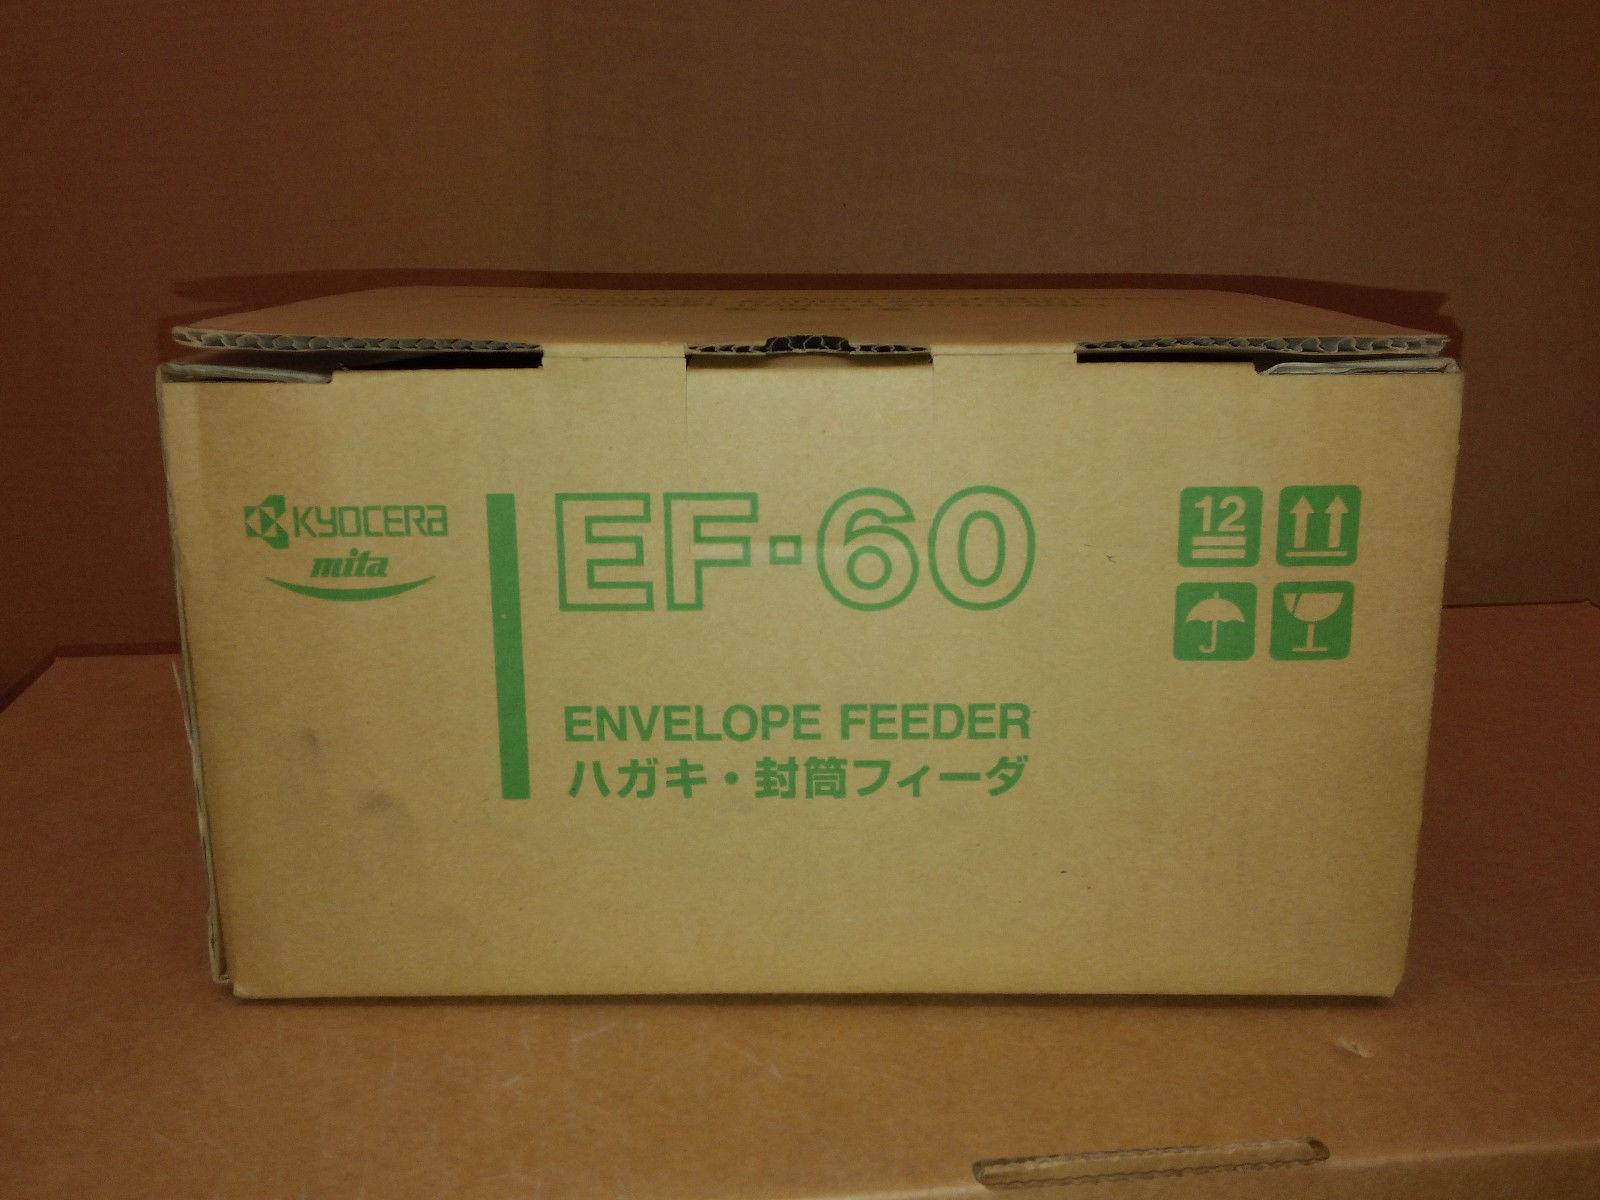 Kyocera EF-60 Envelope Feeder - For FS-1920, FS-3820N, FS-3830N, FS-C5016N